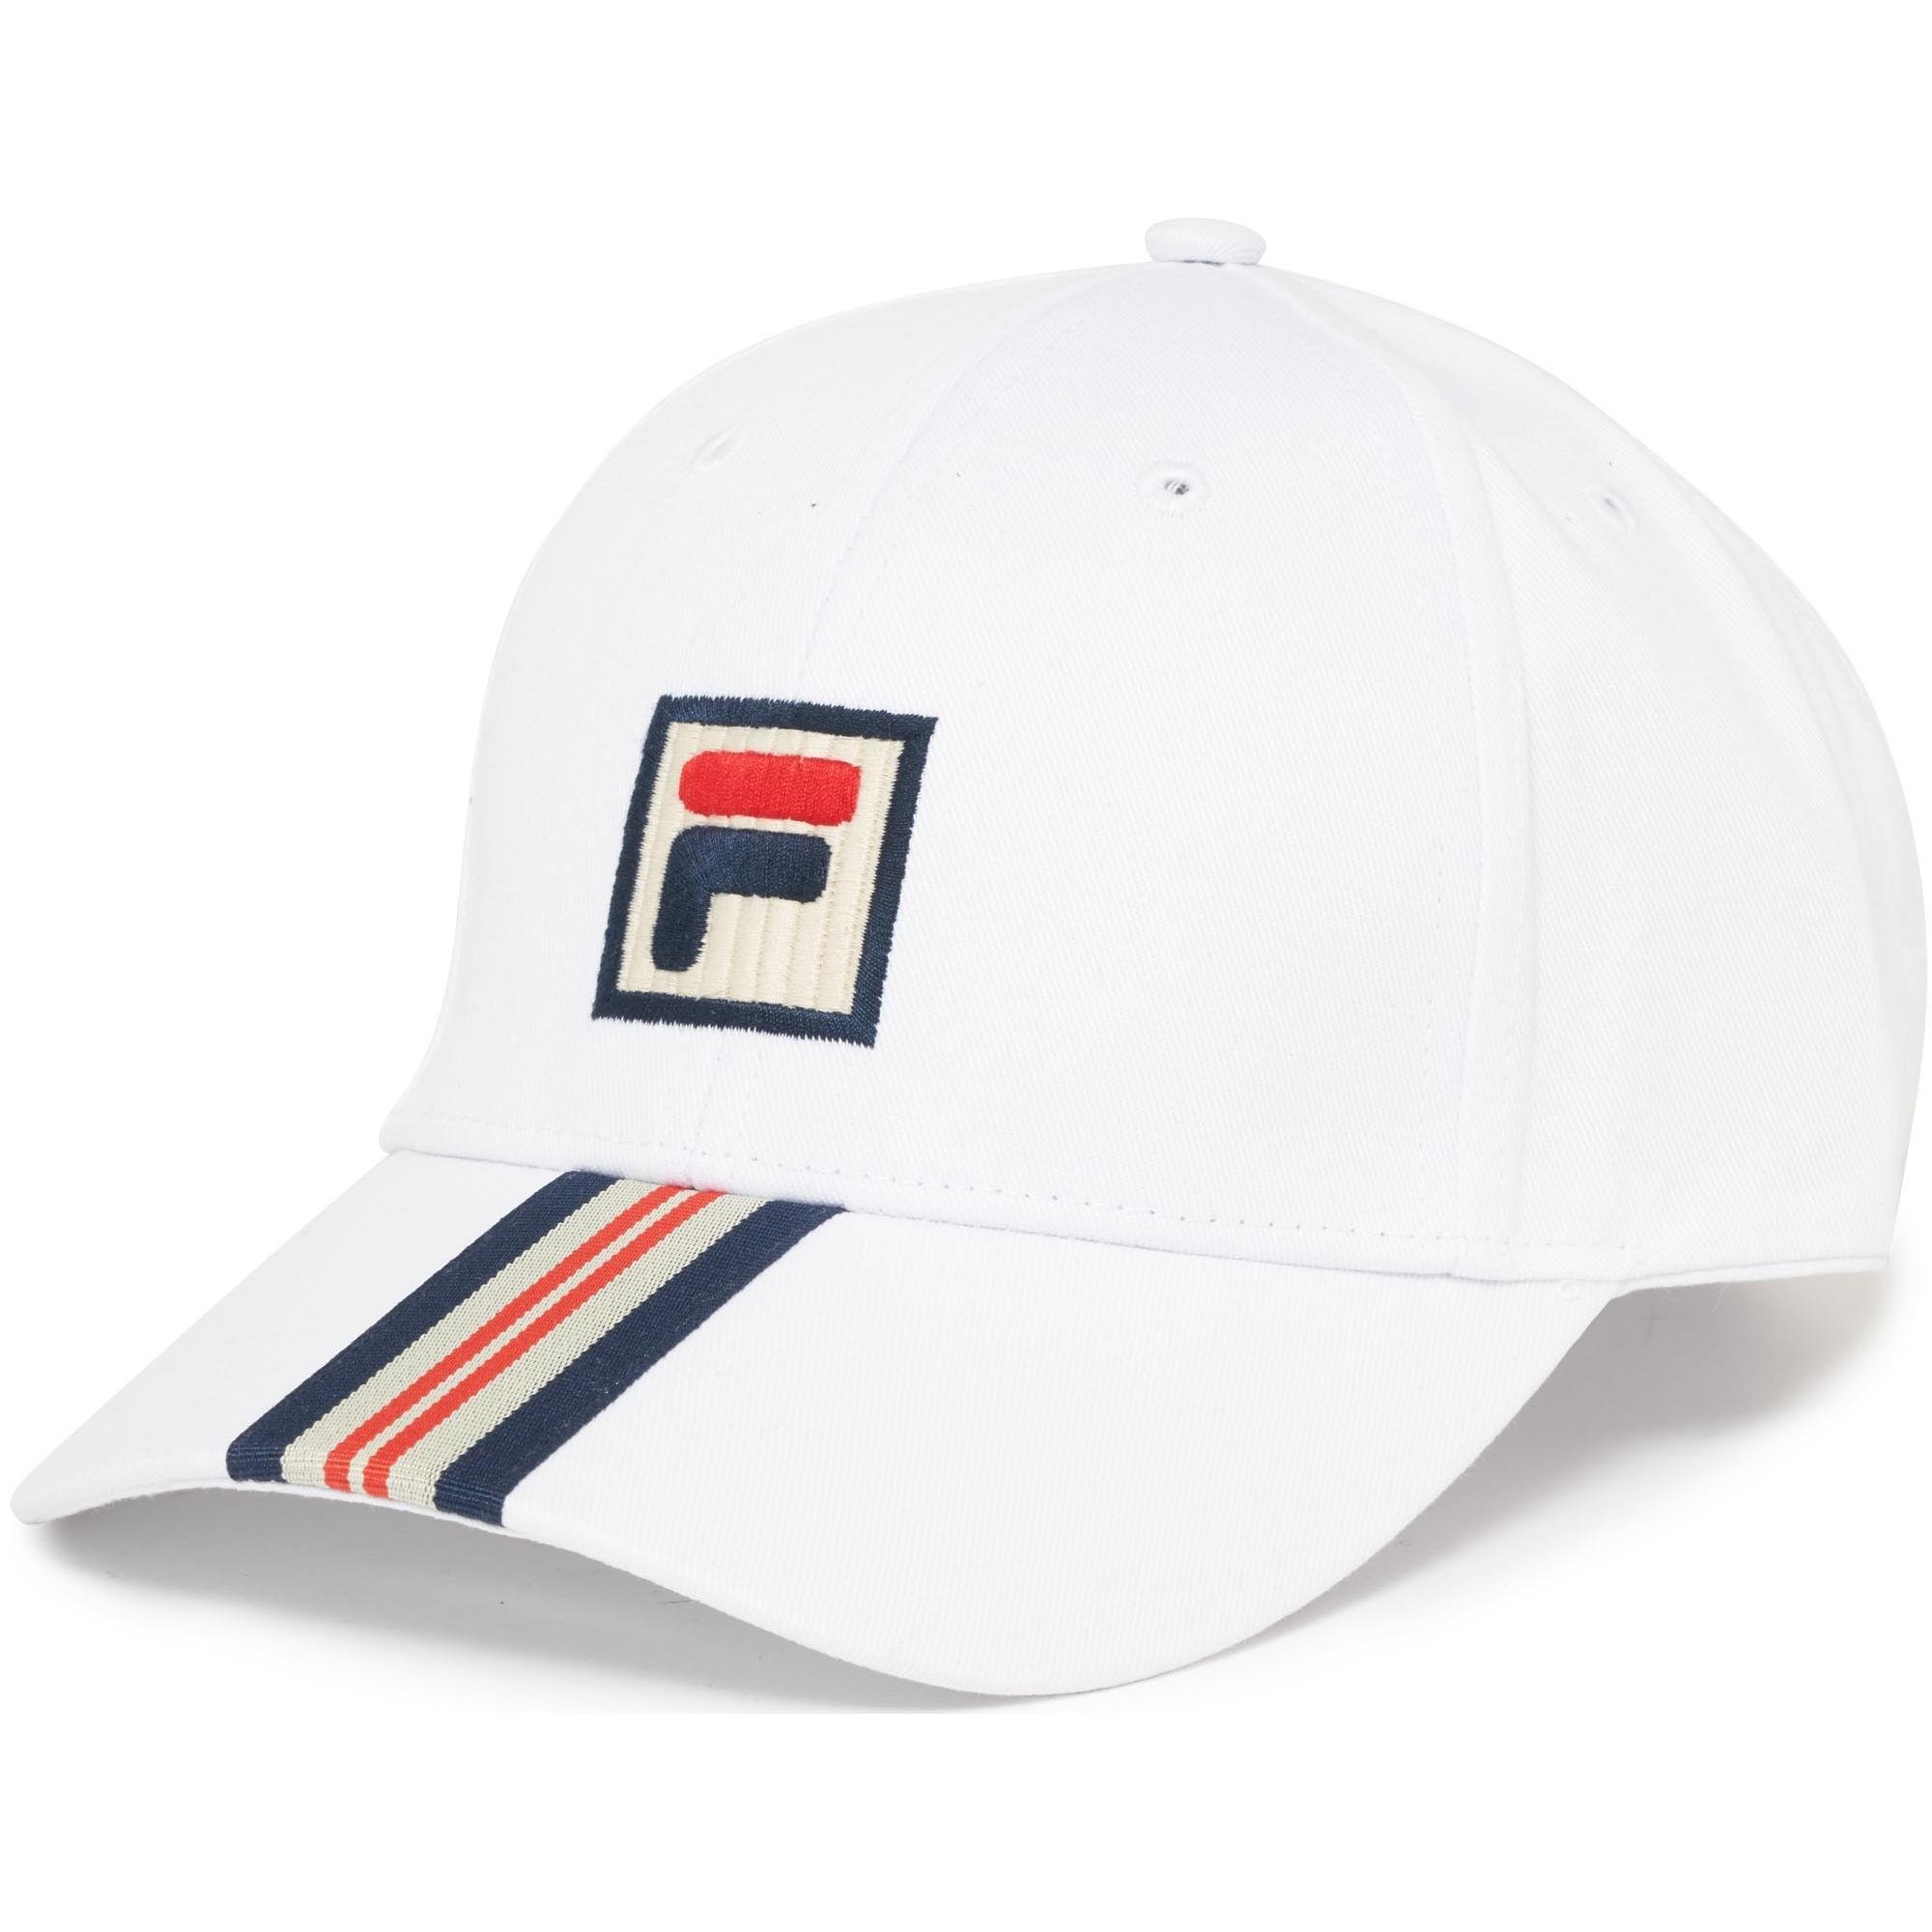 47aa540a Fila Vintage White Walker Baseball Cap in White for Men - Lyst